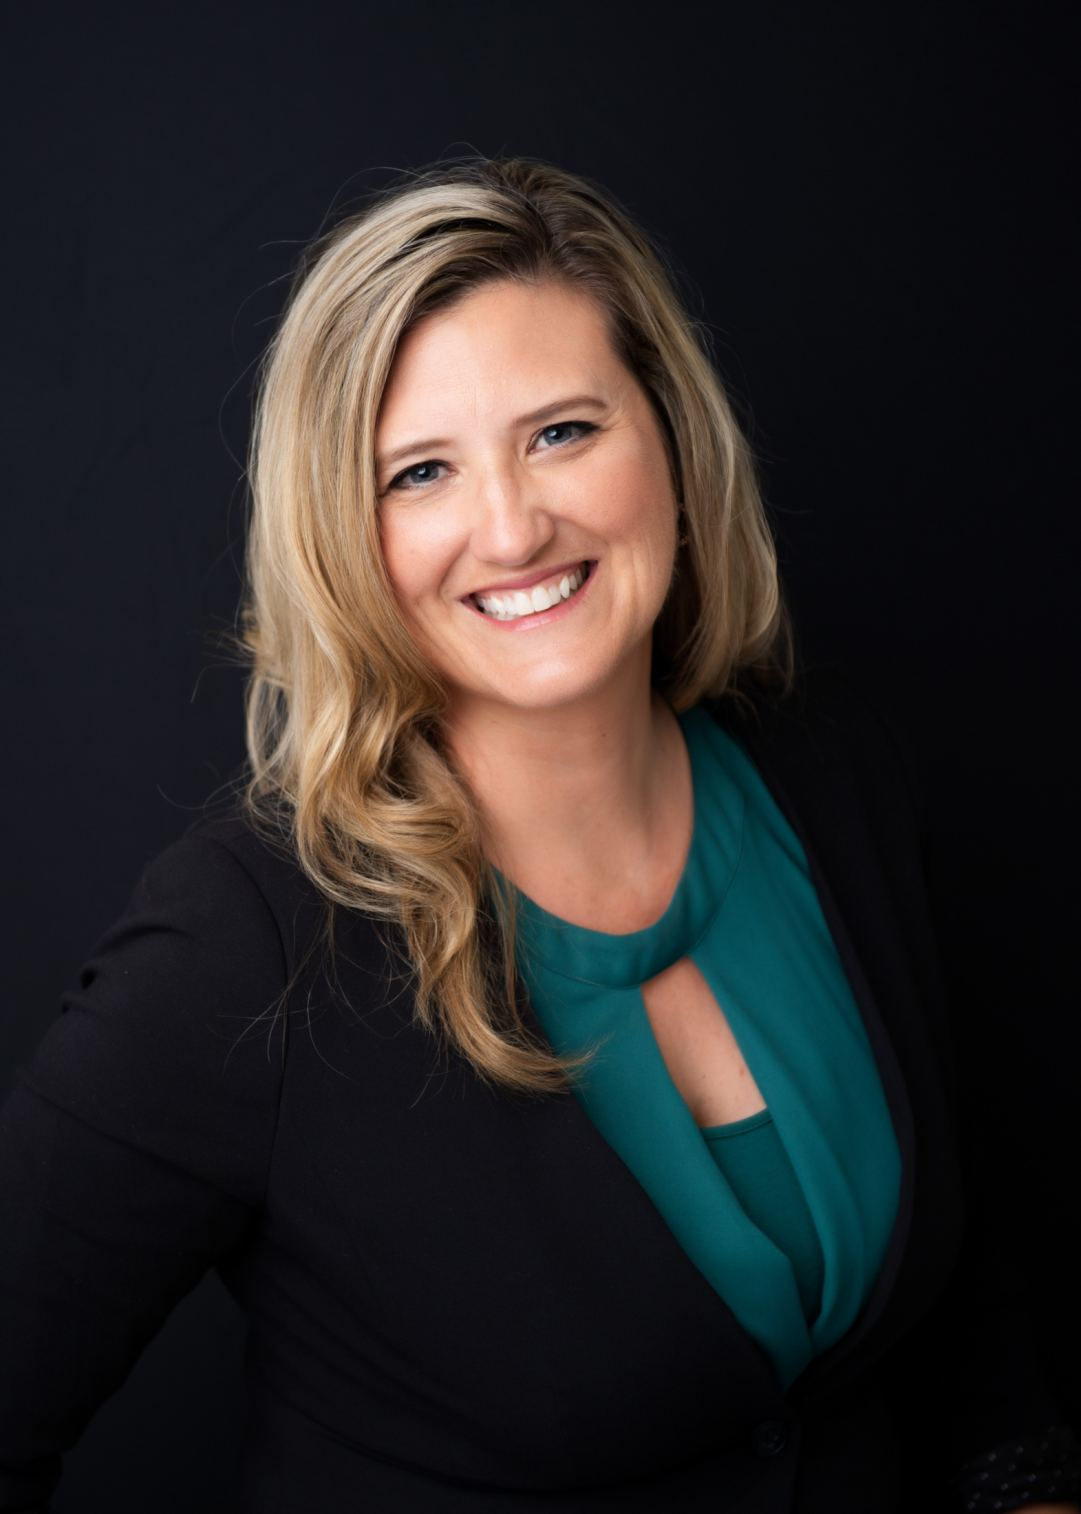 Michelle Simms, Strive Coaching Studio Founder